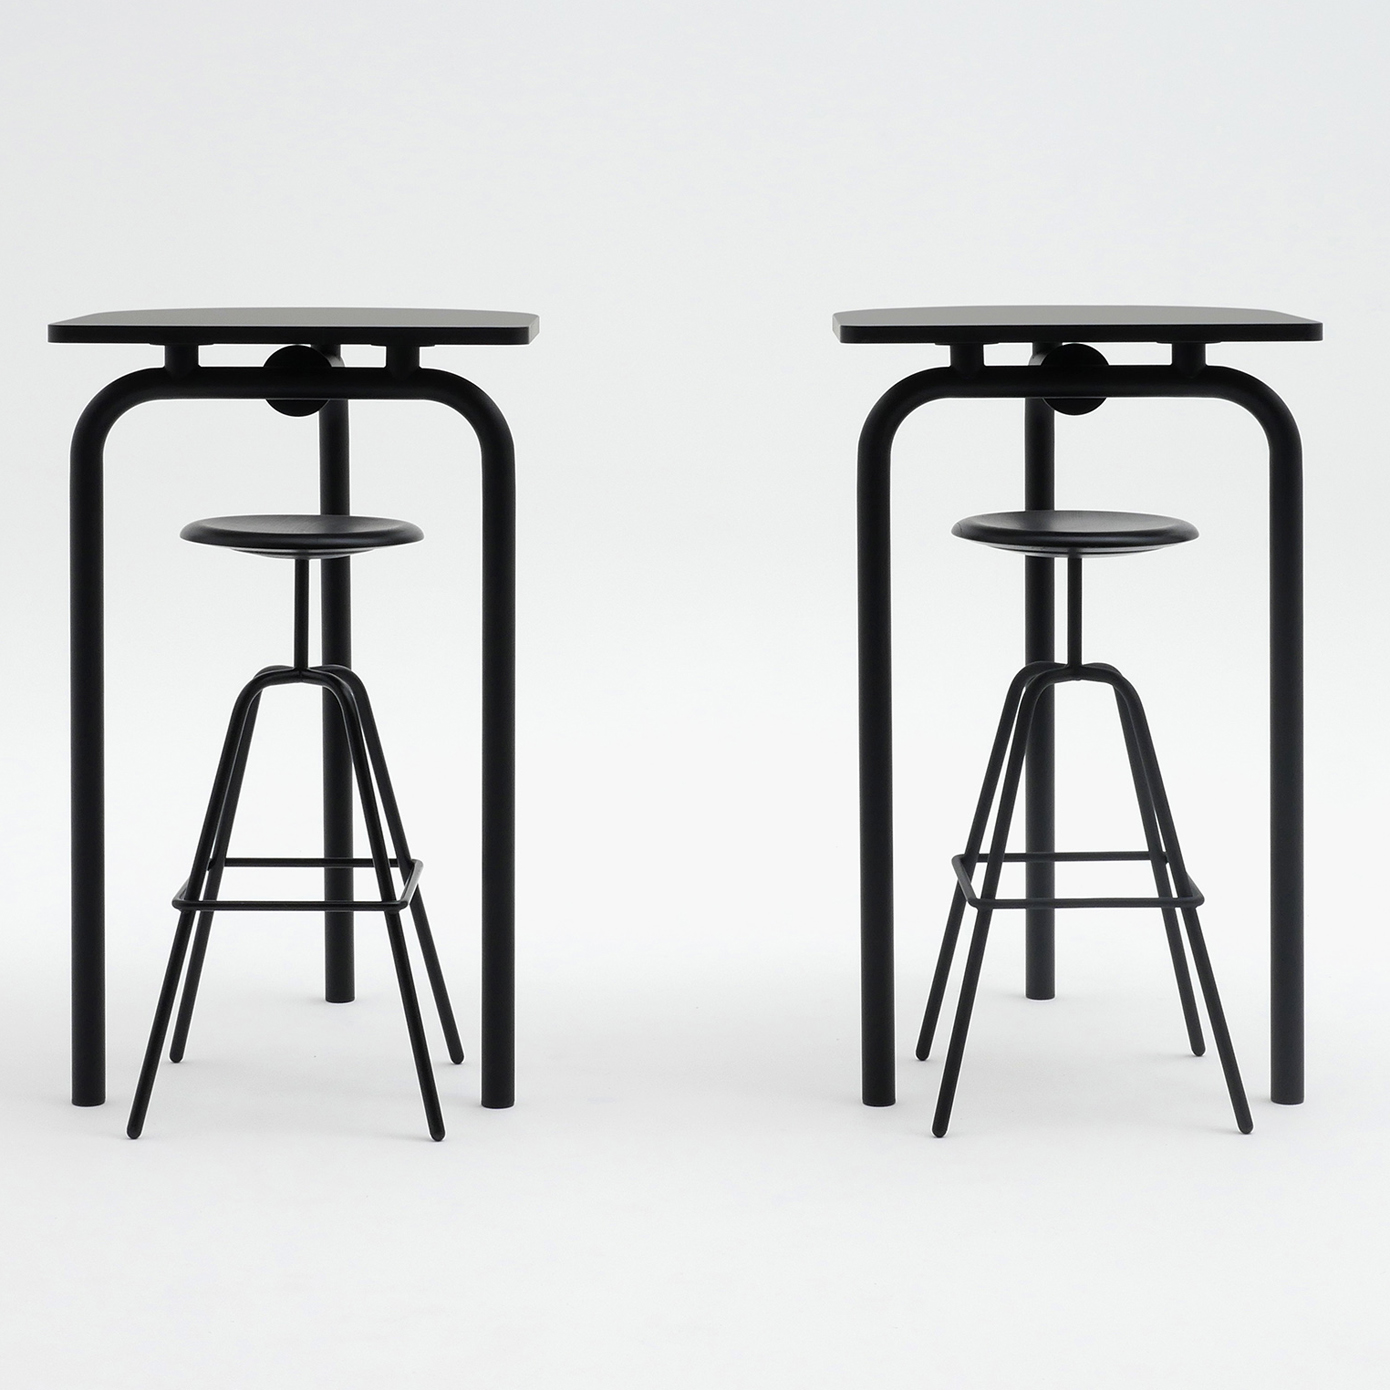 AtelierHaussmann-Tisch-PiombinoAlto-schwarz-gruppe crop